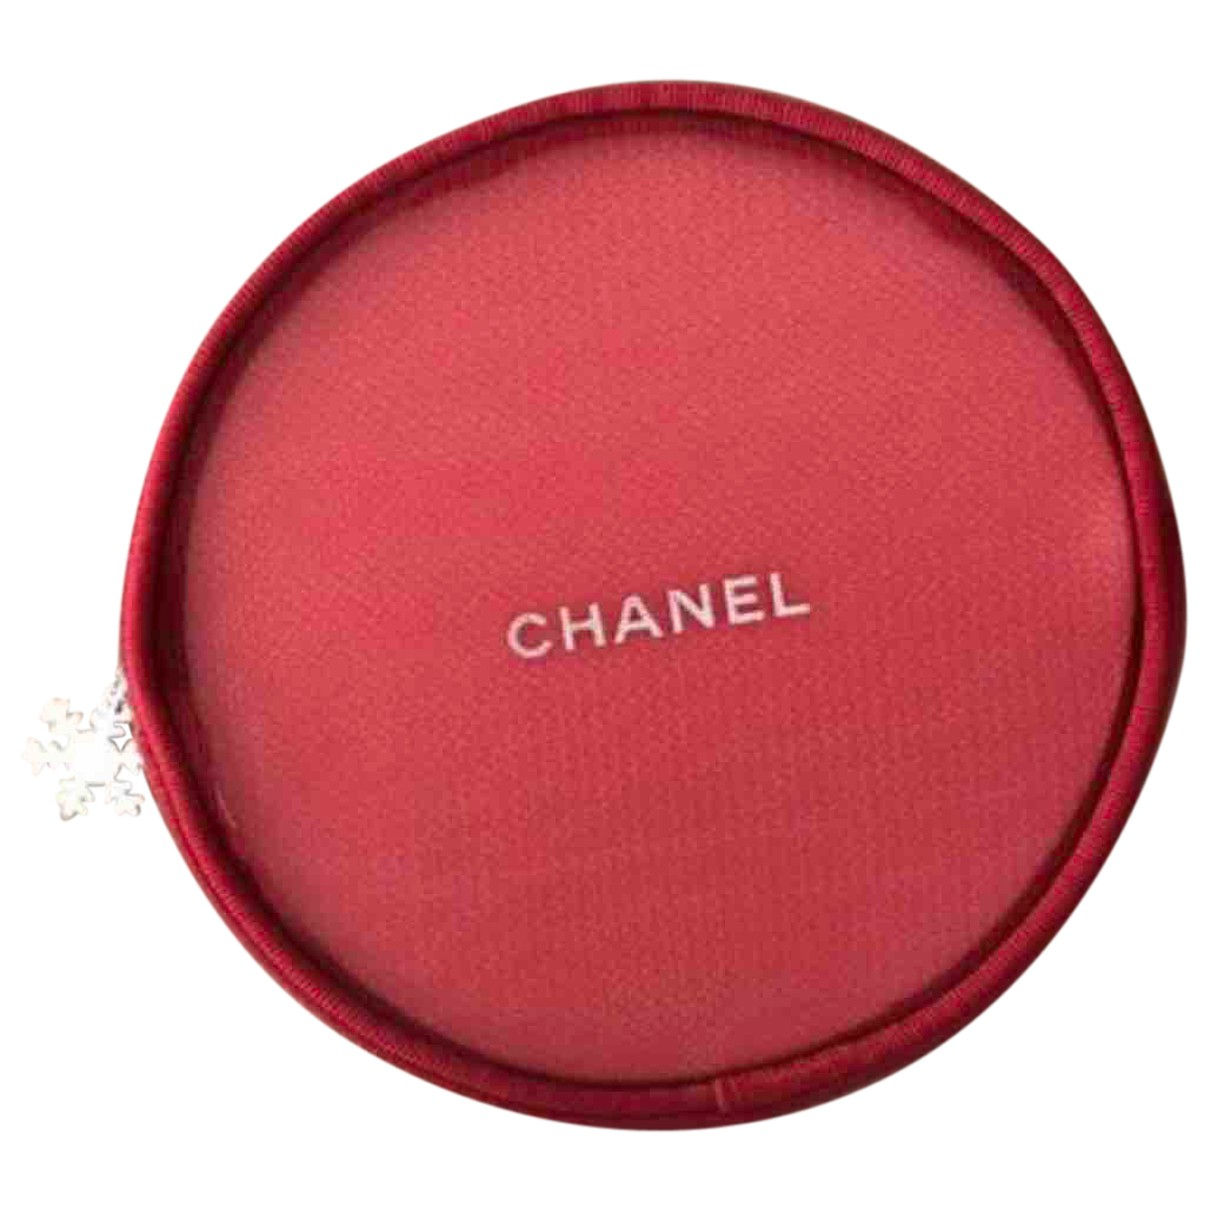 Chanel - Petite maroquinerie   pour femme - rouge